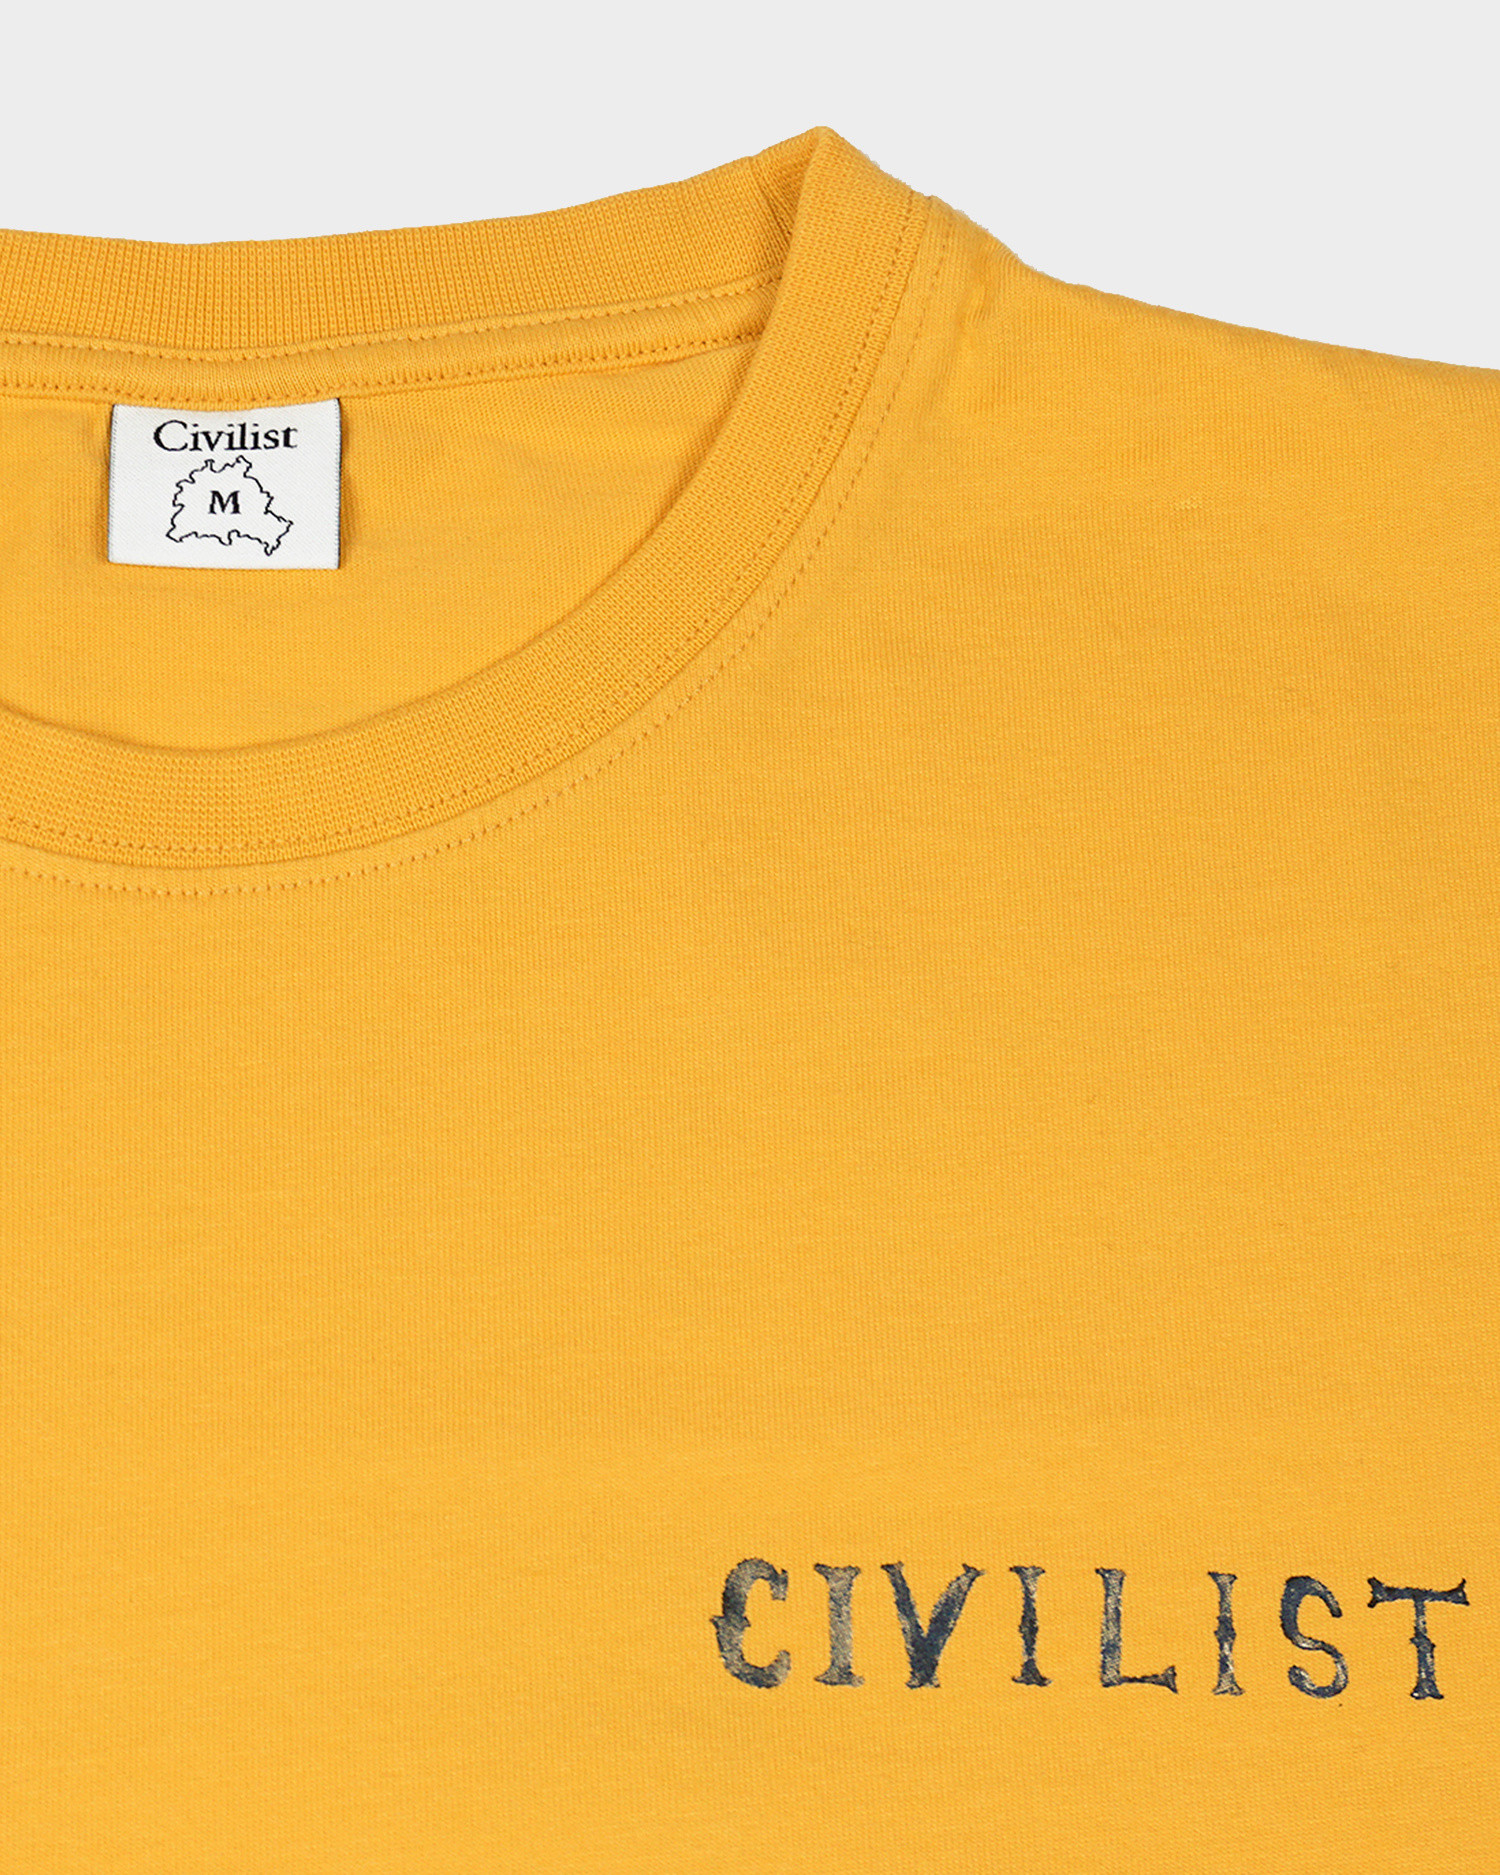 Civilist LSD Magician Tee Old Yellow